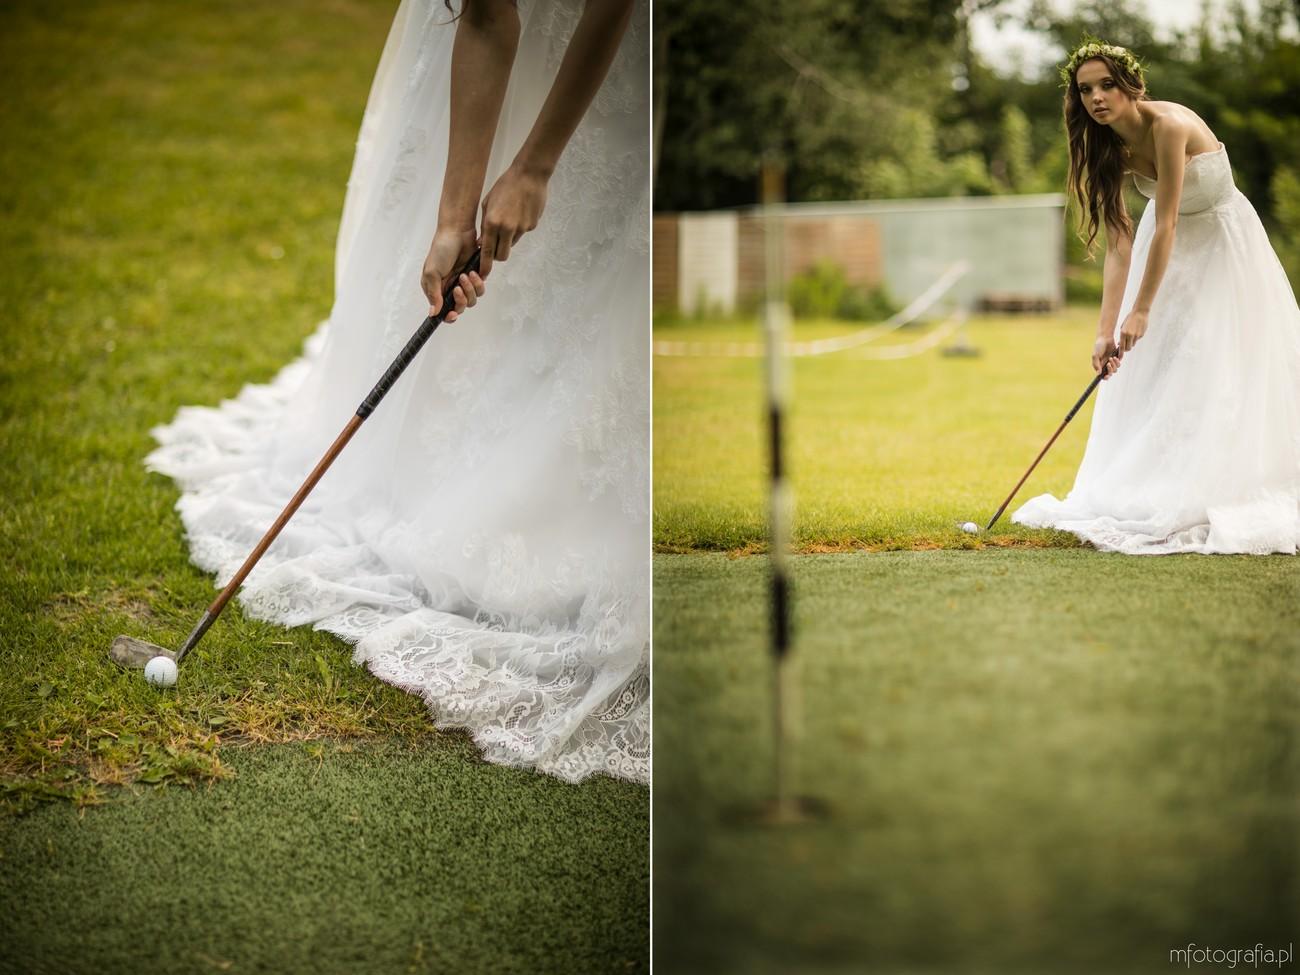 pani młoda gra w golfa